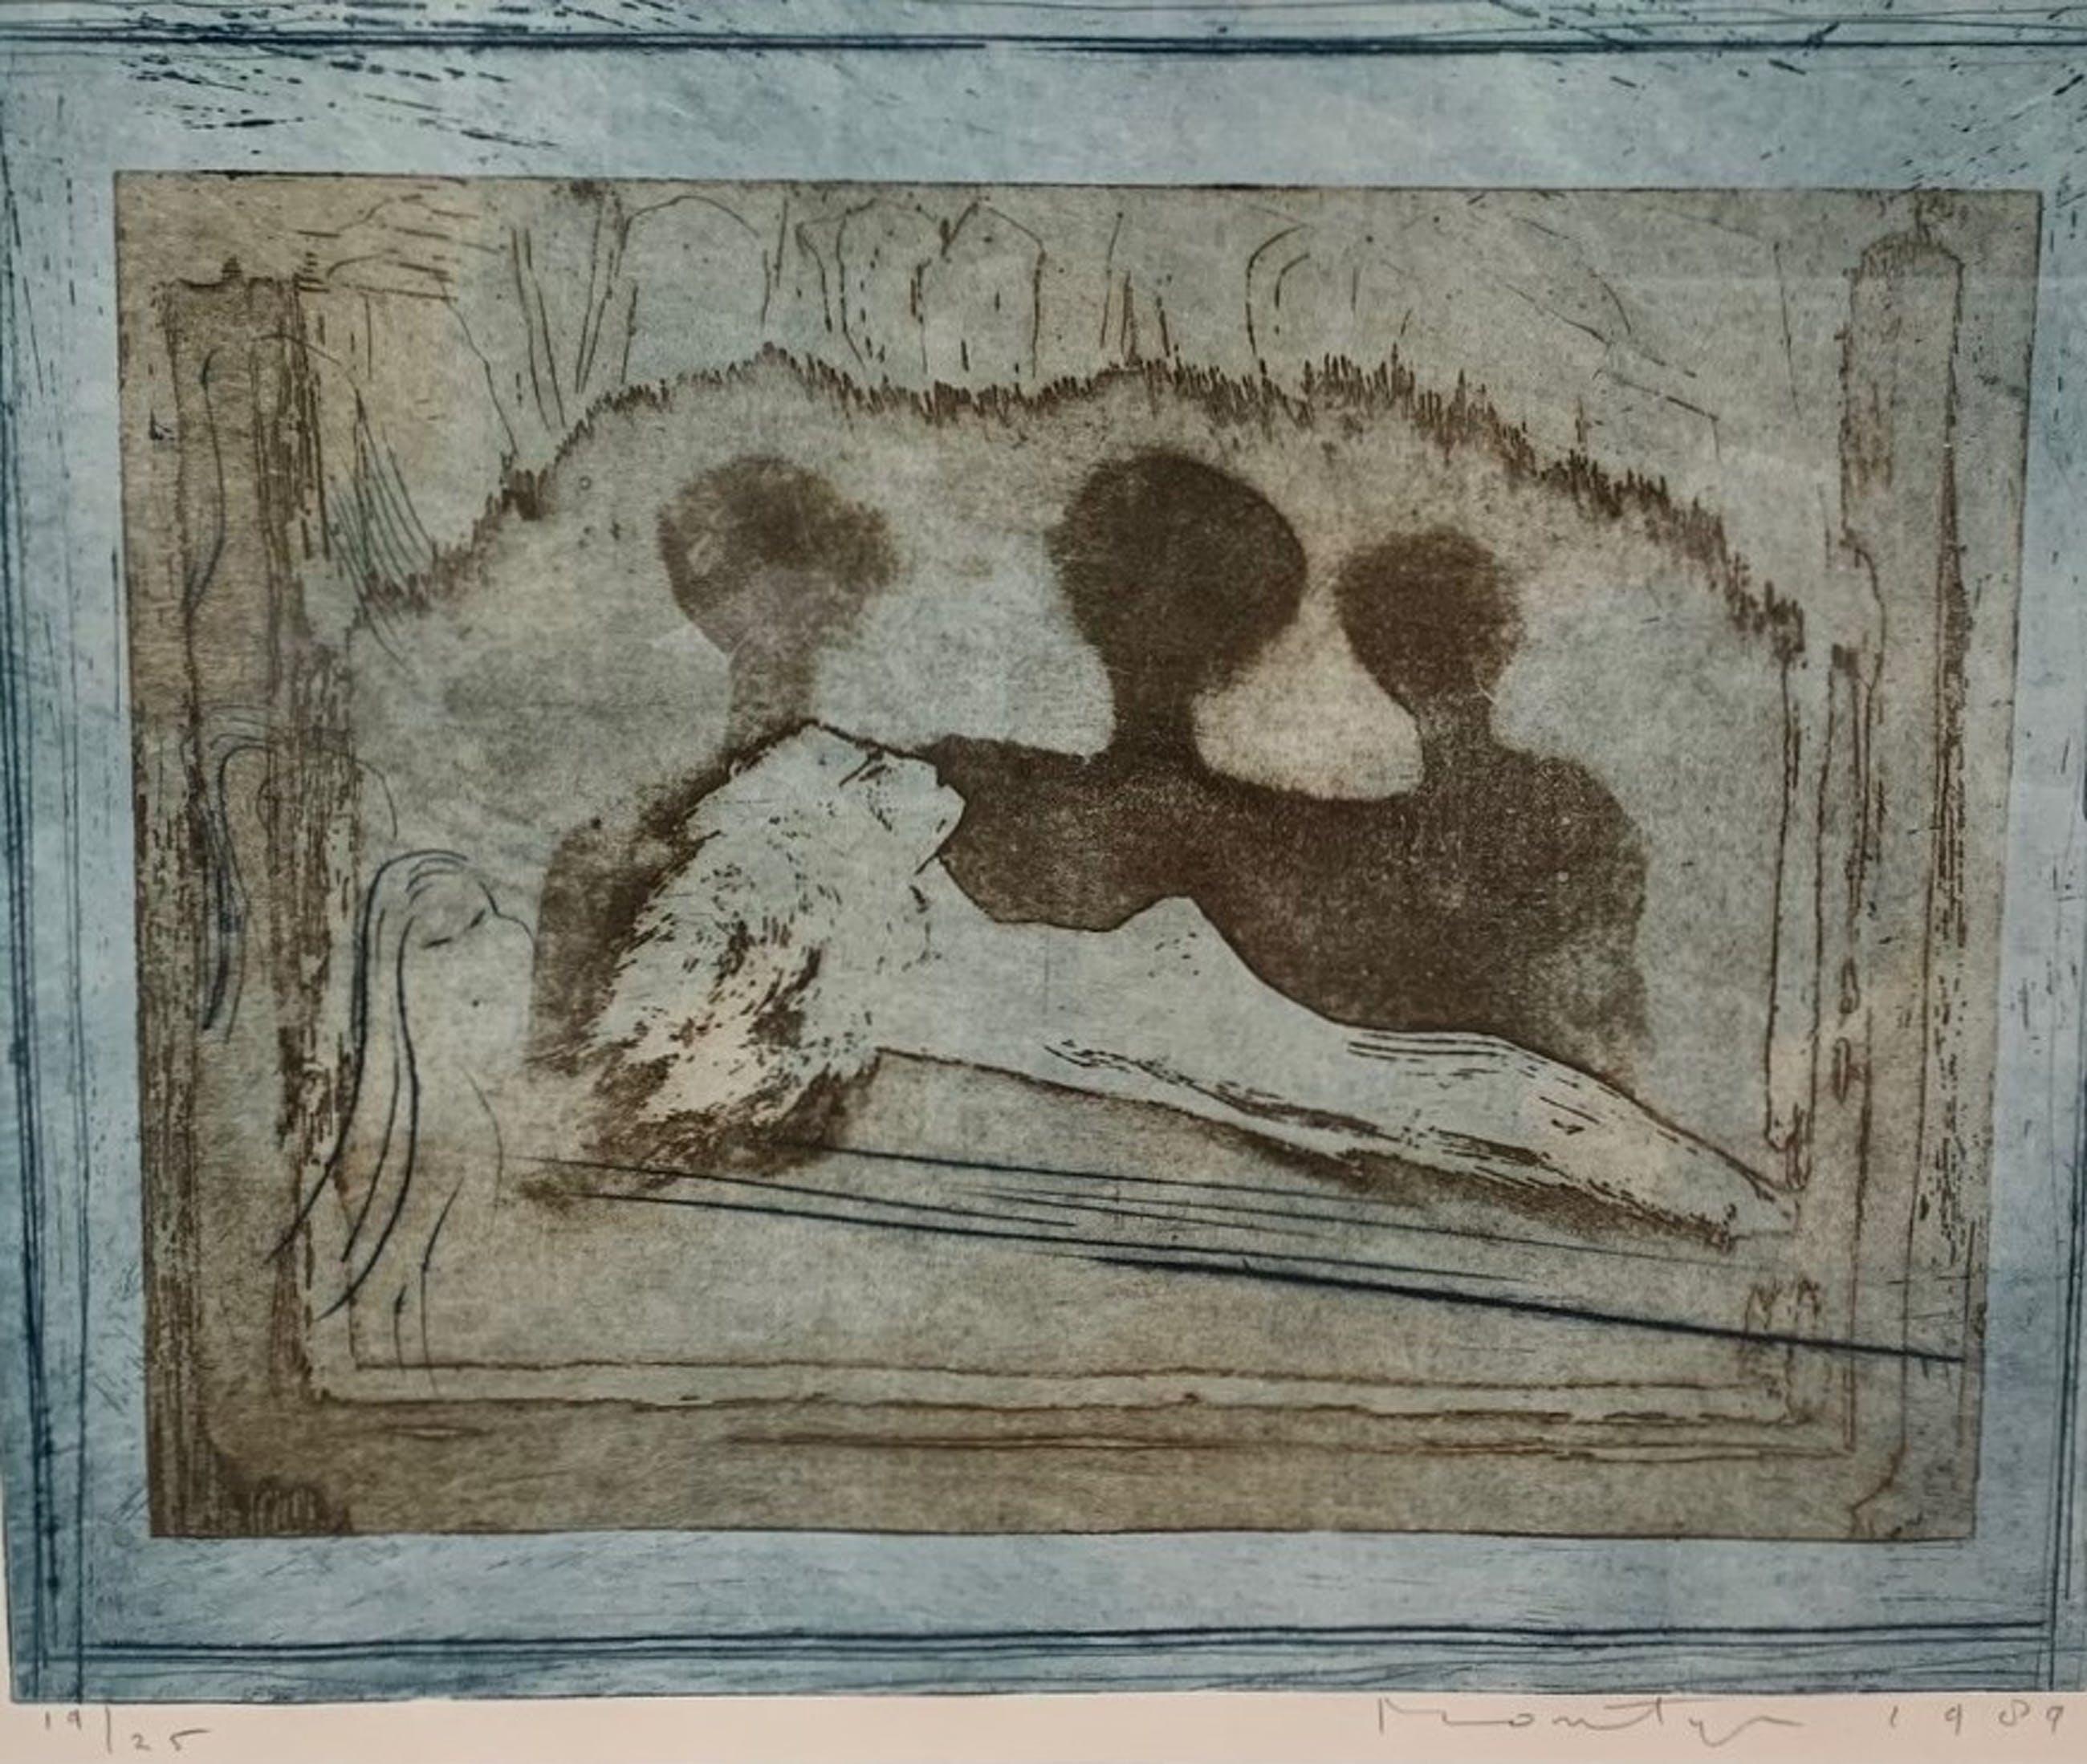 Jan Montyn - Leçon d'amour kopen? Bied vanaf 100!